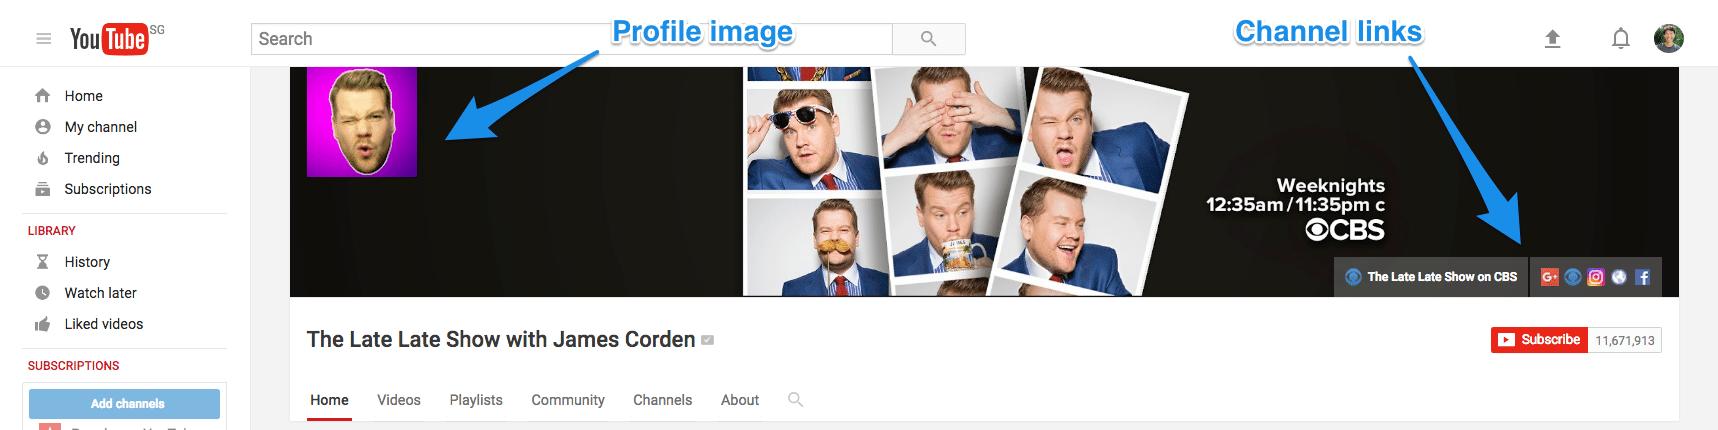 YouTube channel art overlay